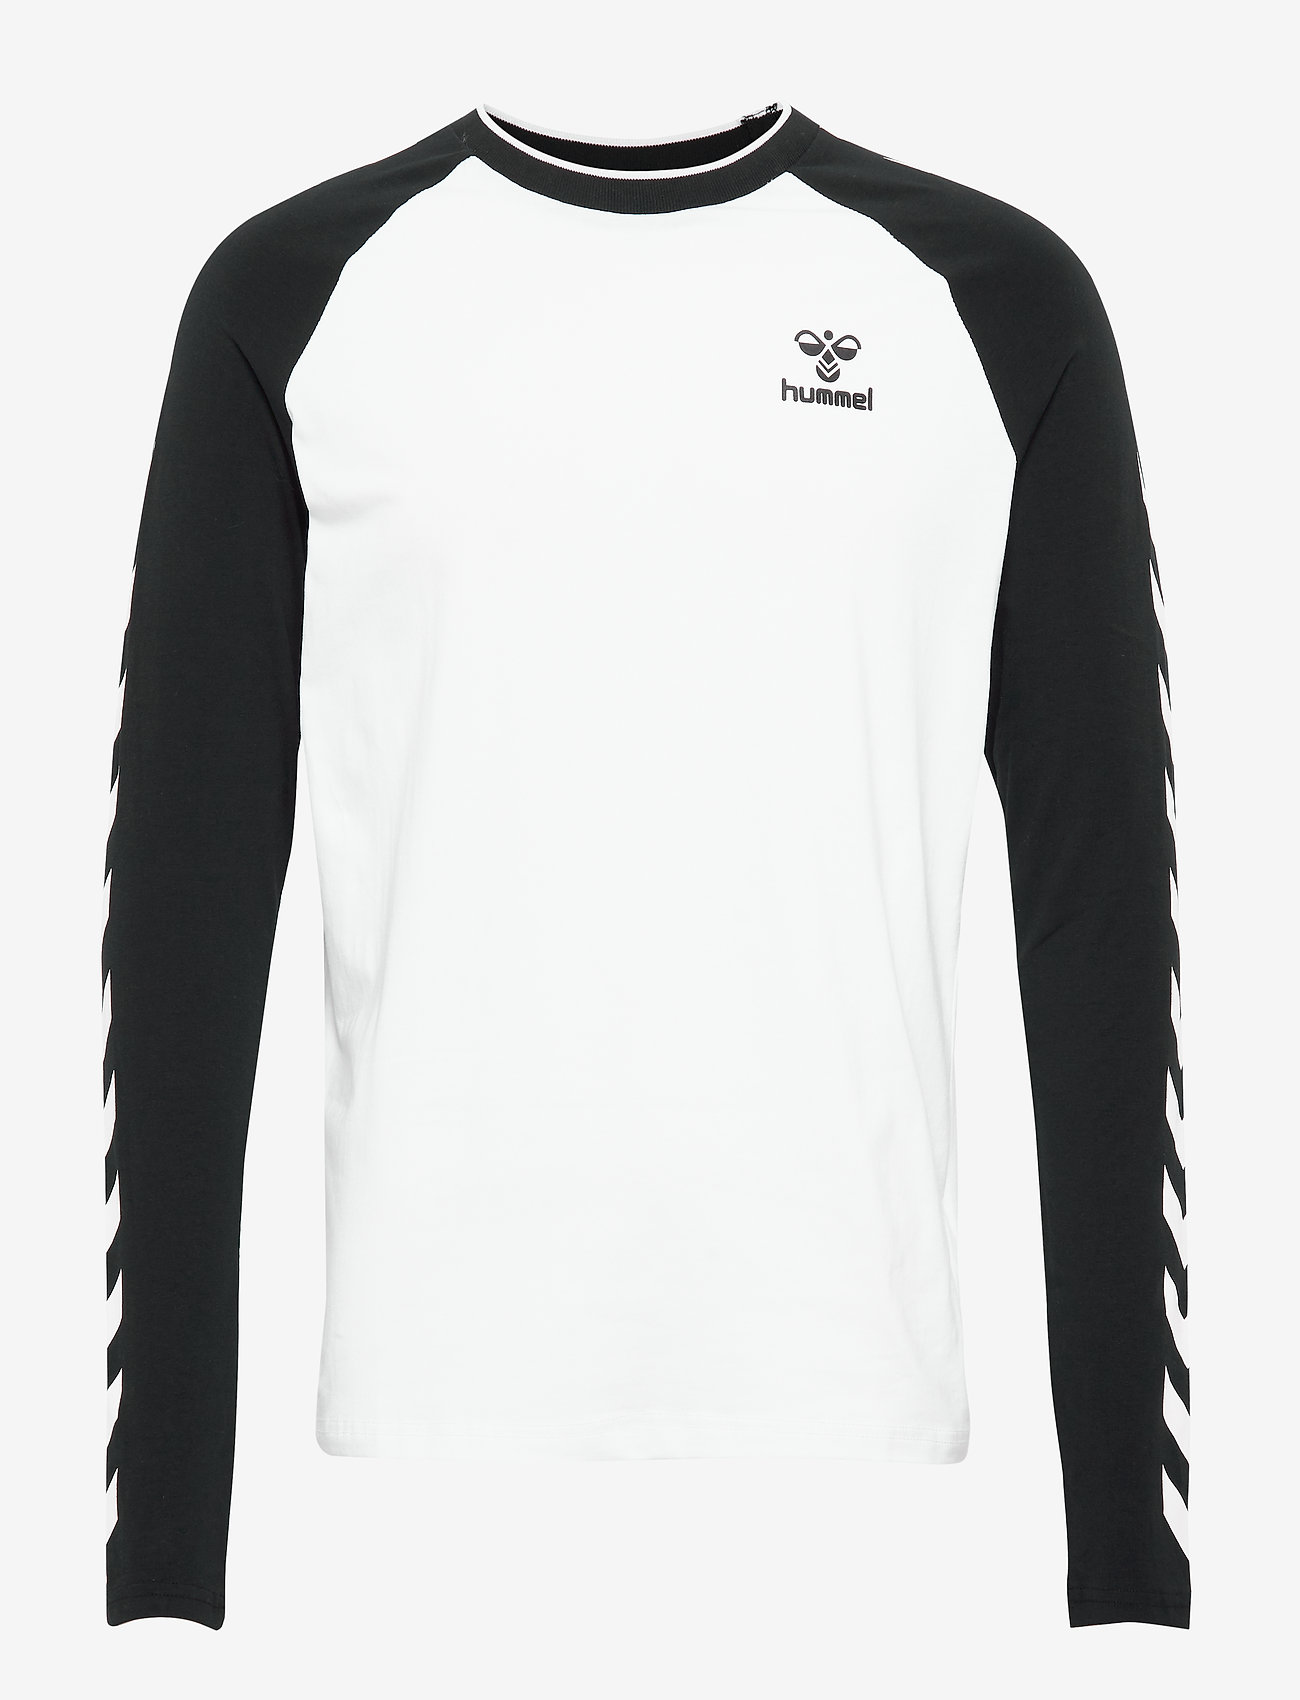 Hummel - hmlMARK T-SHIRT L/S - langarmshirts - white - 0